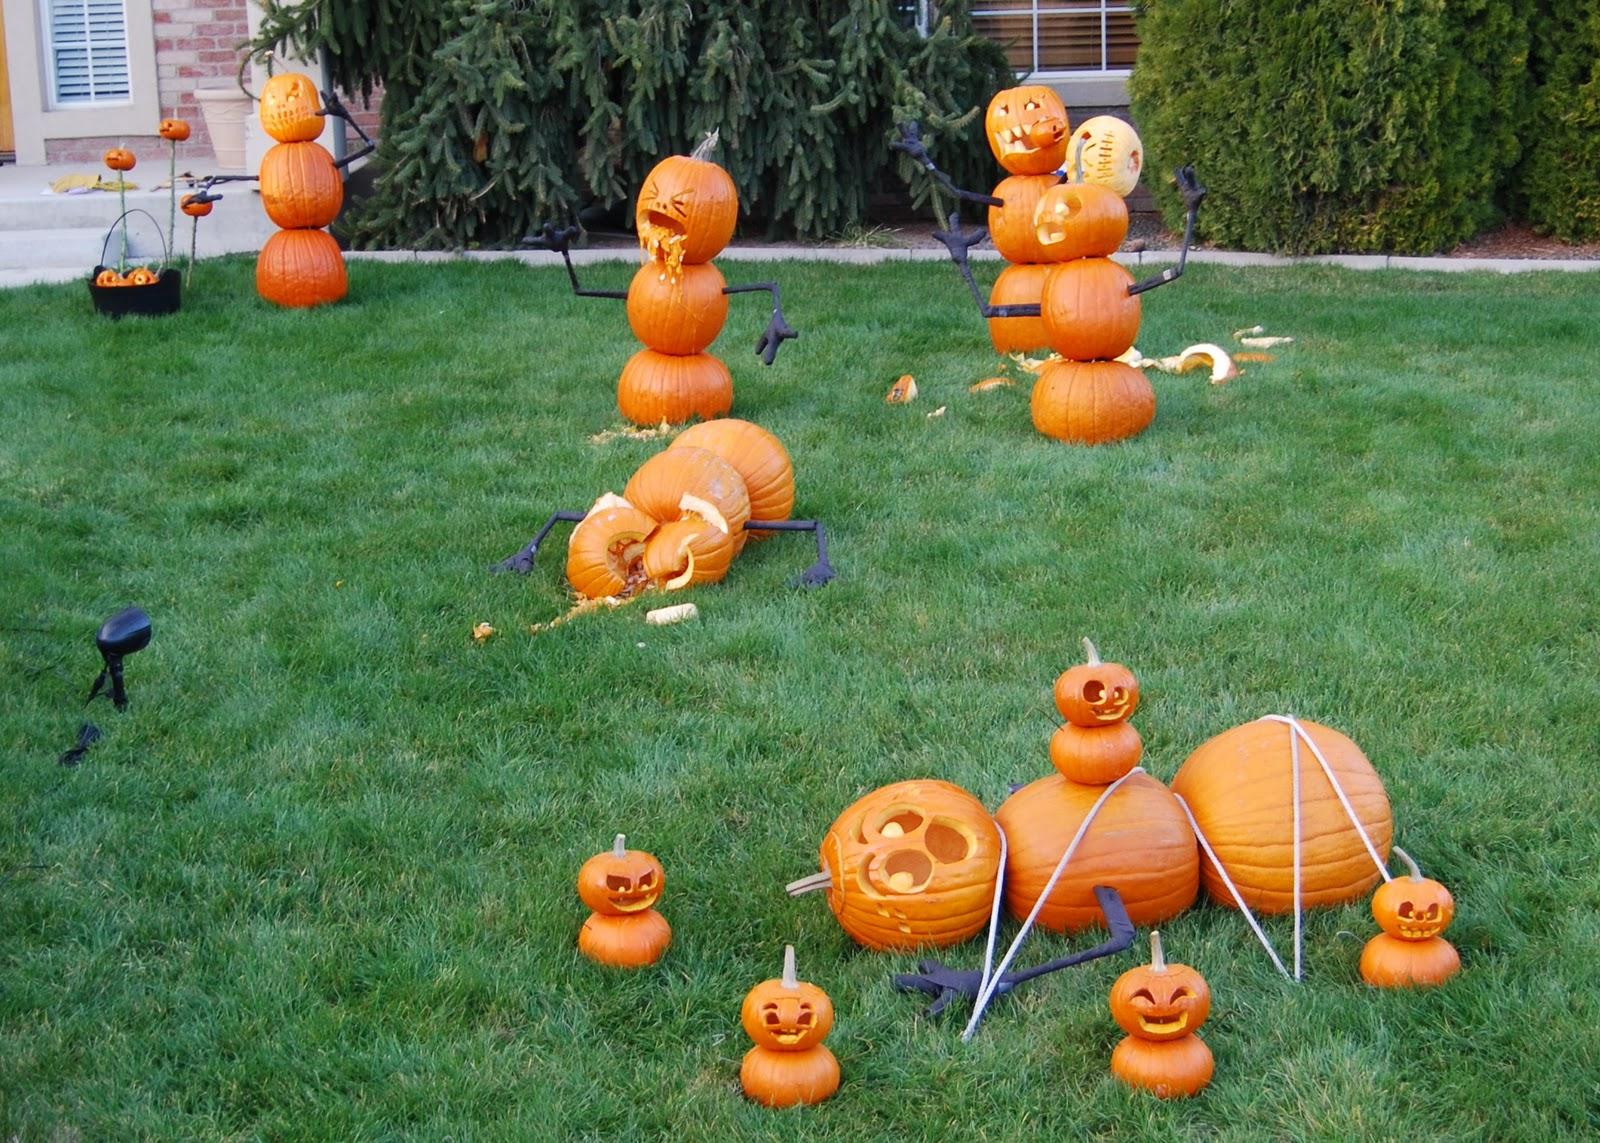 The Great Pumpkin Massacre [à la Calvin and Hobbes]